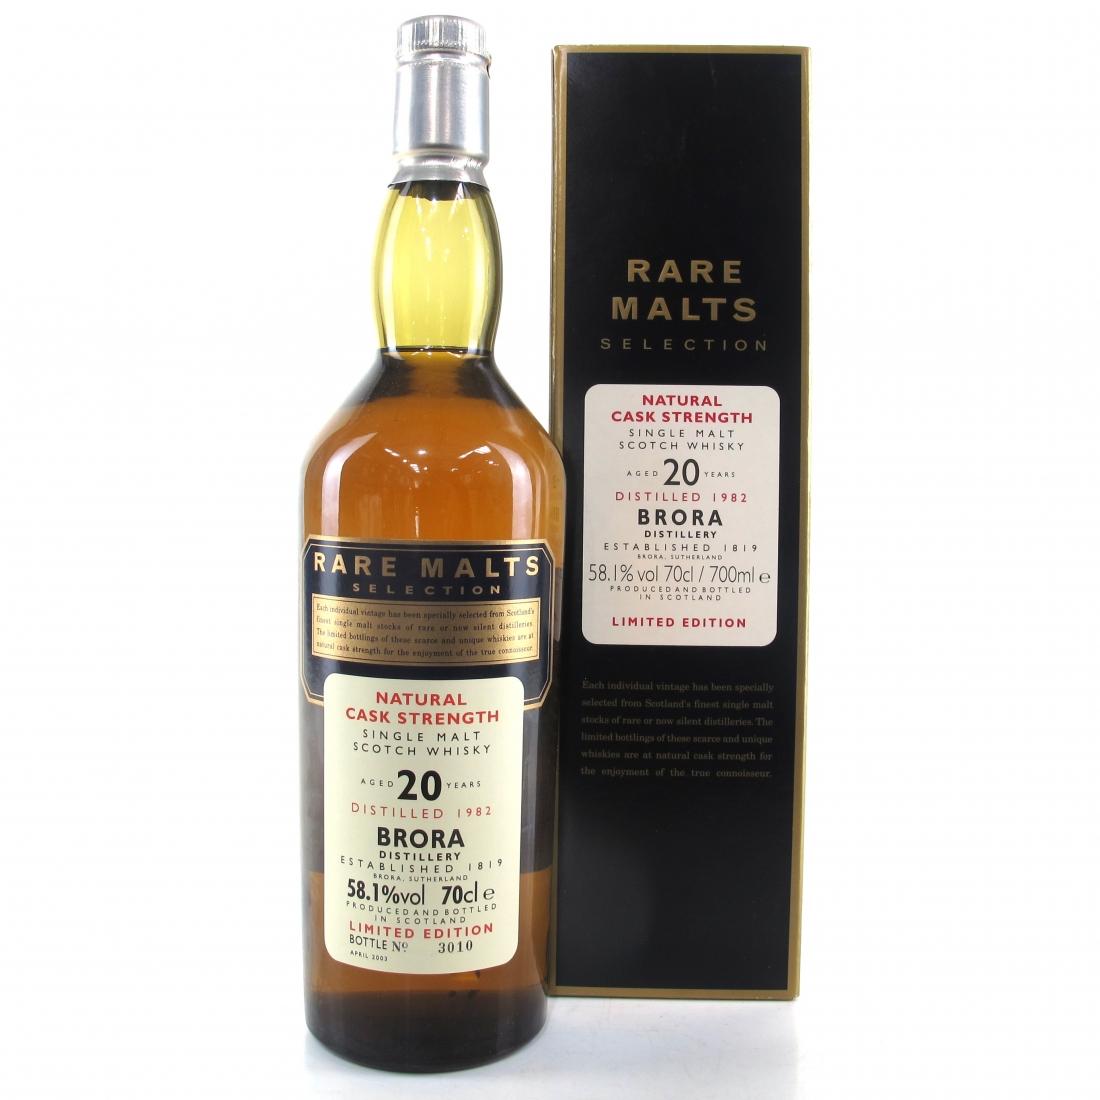 Brora 1982 Rare Malt 20 Year Old / 58.1%